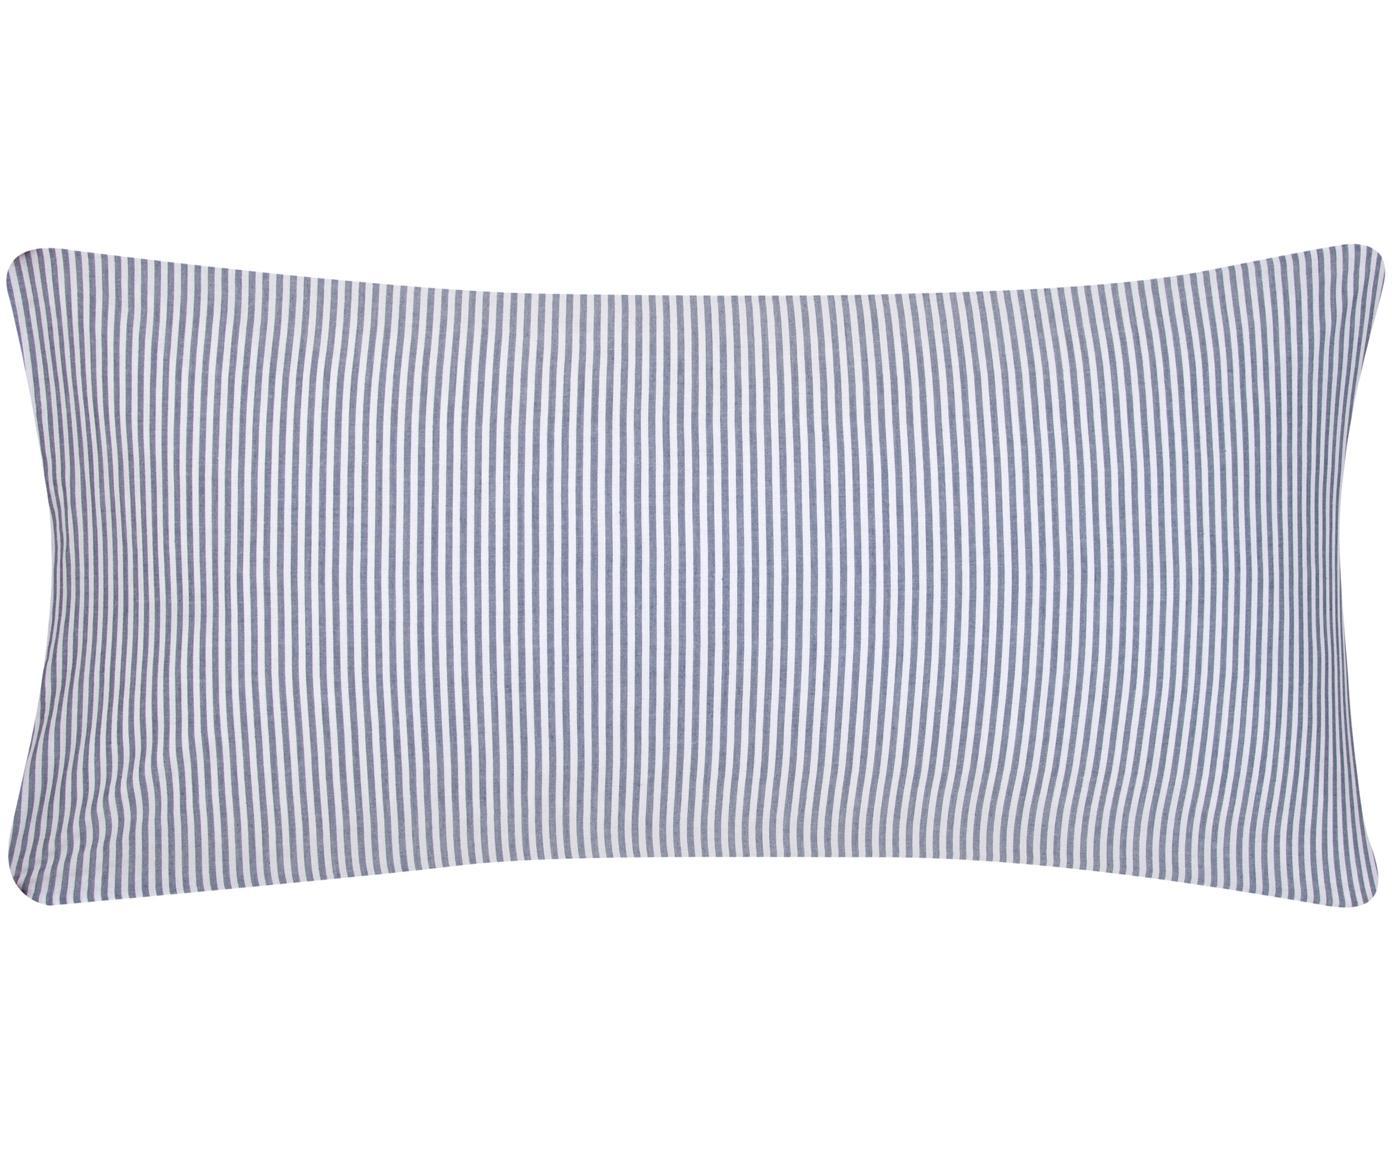 Funda de almohada en tejido renforcé Ellie, Blanco, azul oscuro, An 45 x L 85 cm